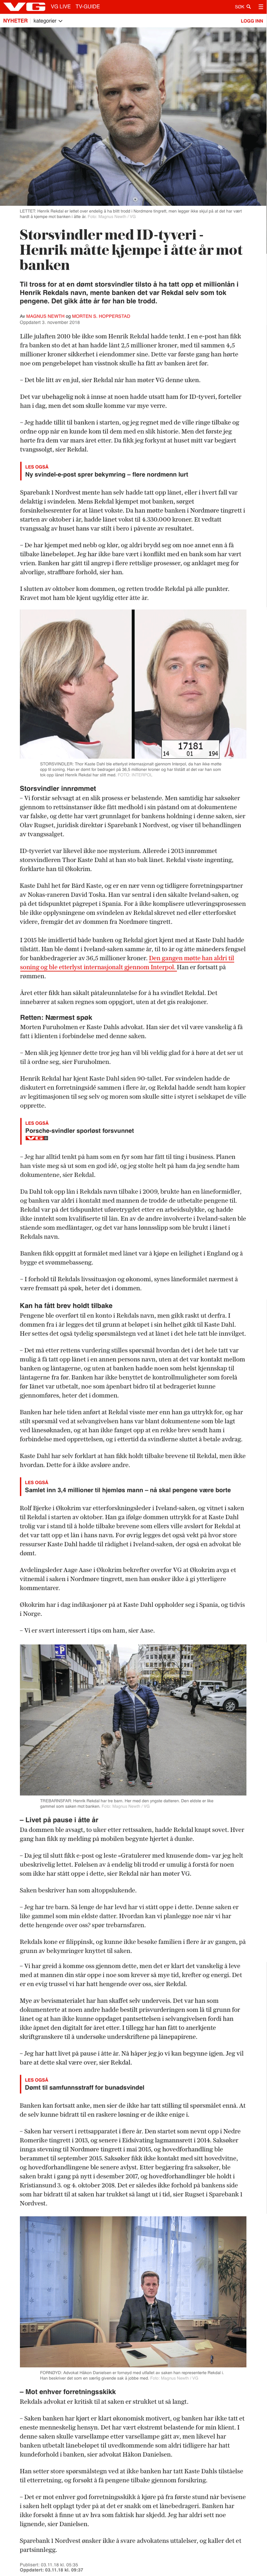 ID-Tyveri Utsatt for ID tyveri. Henrik Rekdal. Advokat Danielsen & Co. Per Danielsen.